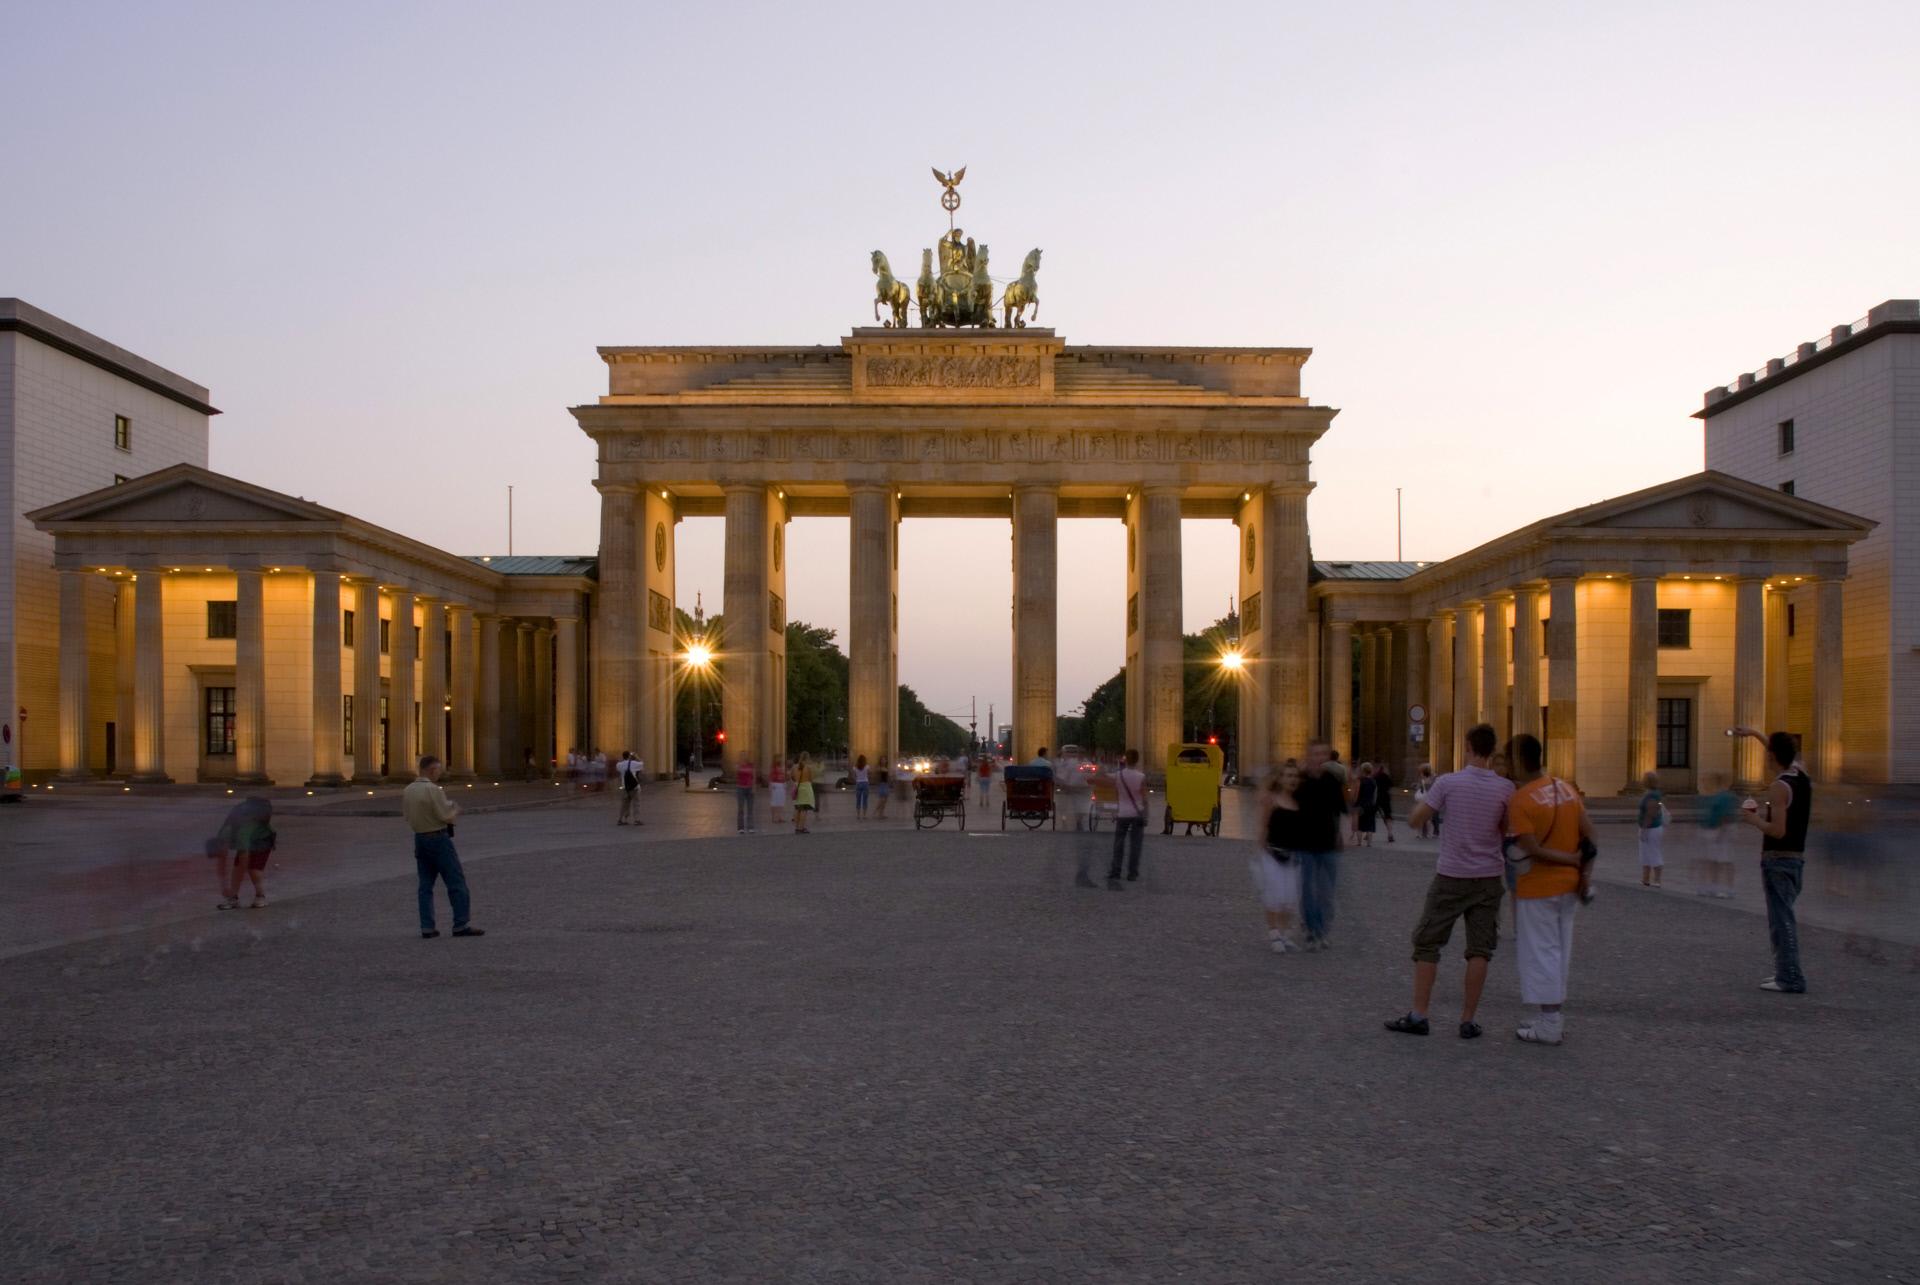 Puerta de Brandeburgo, Berlín / Gtres